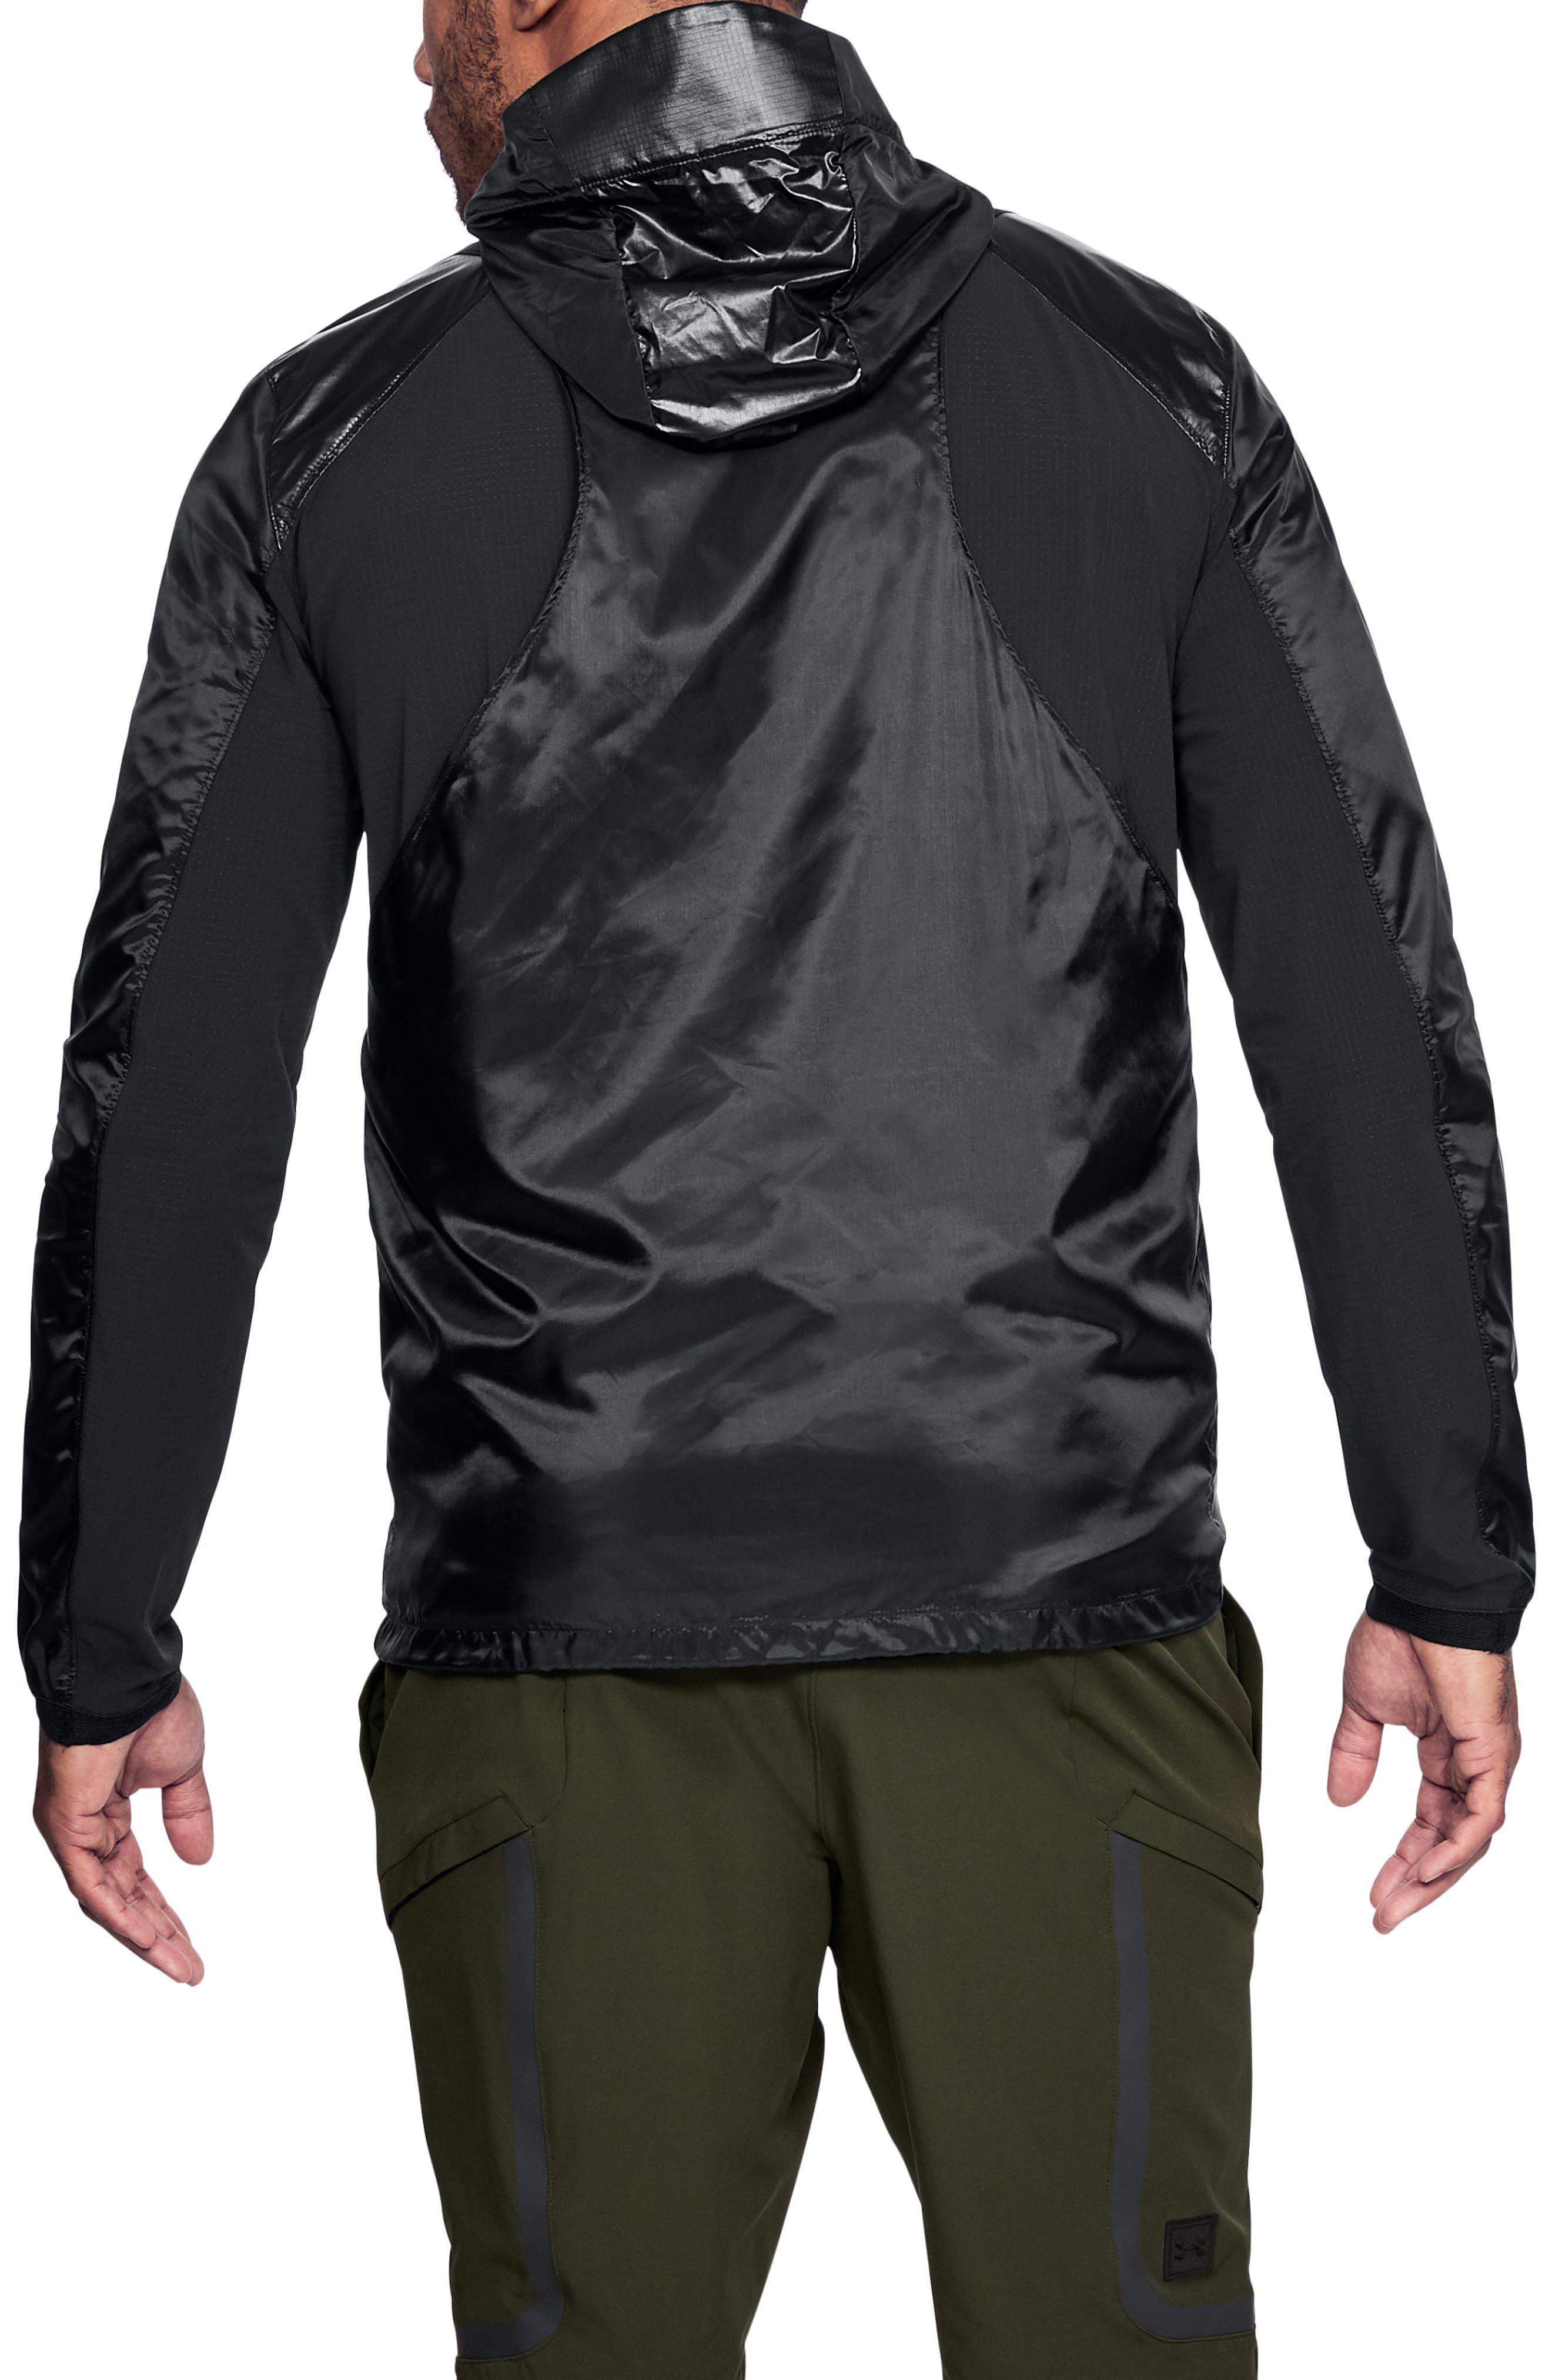 Perpetual Windproof & Water Resistant Hooded Jacket,                             Alternate thumbnail 2, color,                             BLACK/ METALLIC VICTORY GOLD